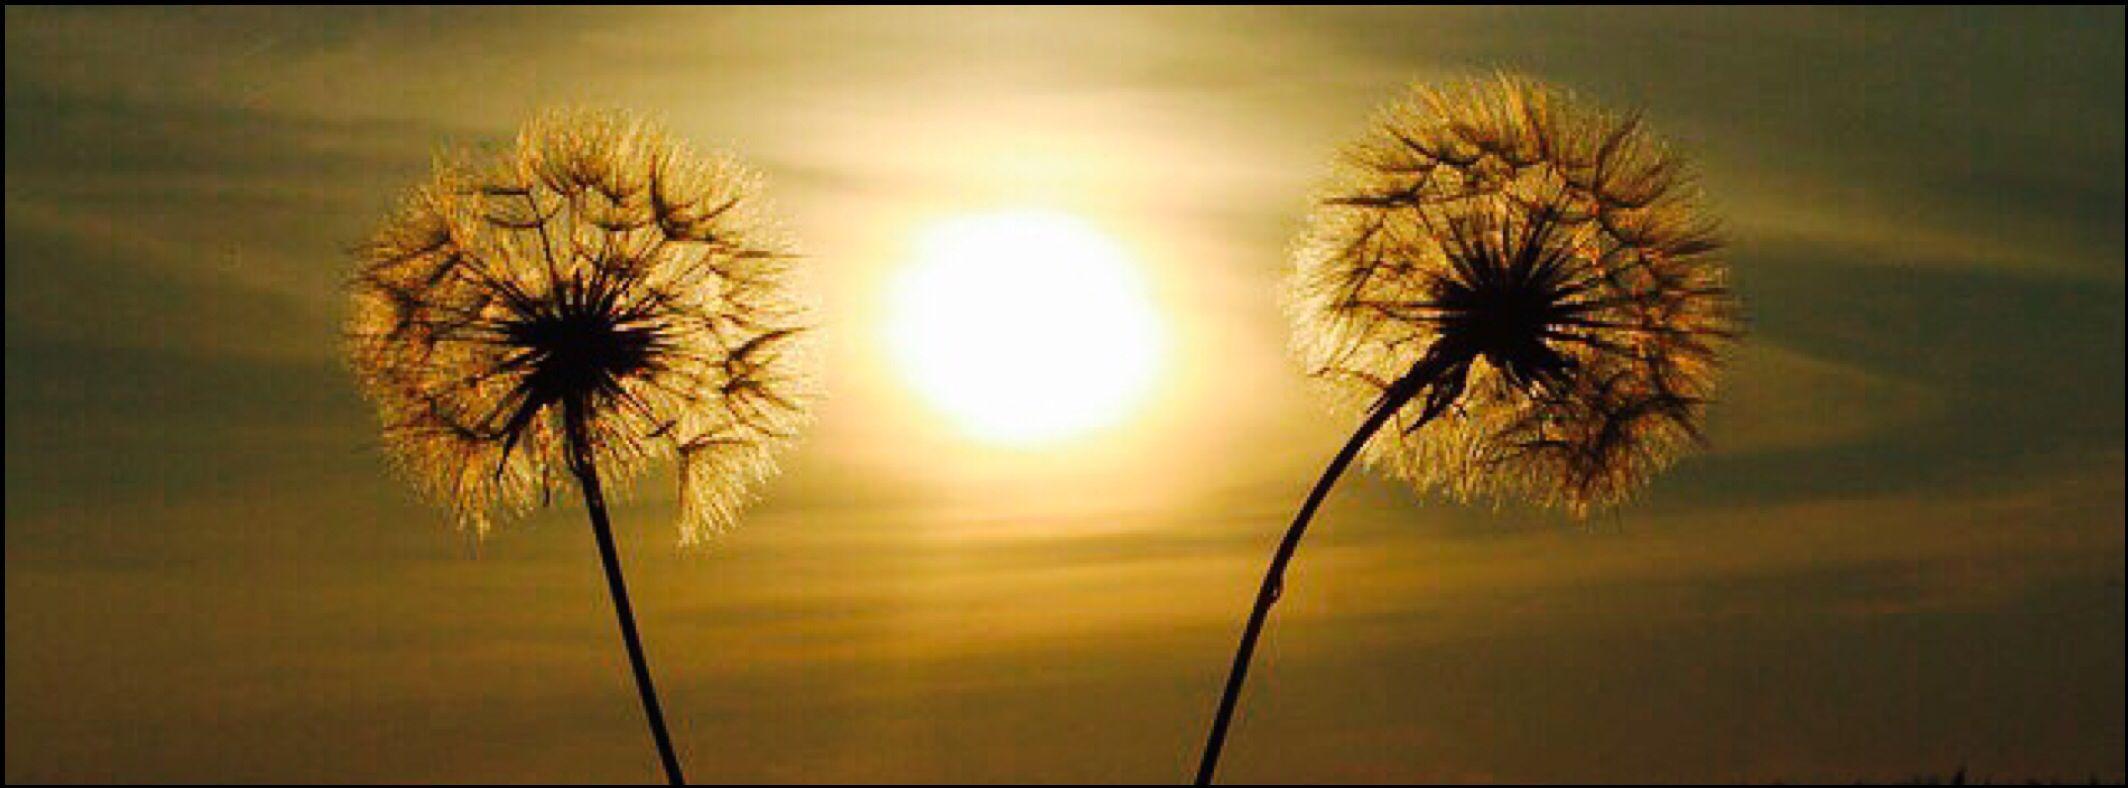 Dandelion on a sunset facebook cover Facebook cover